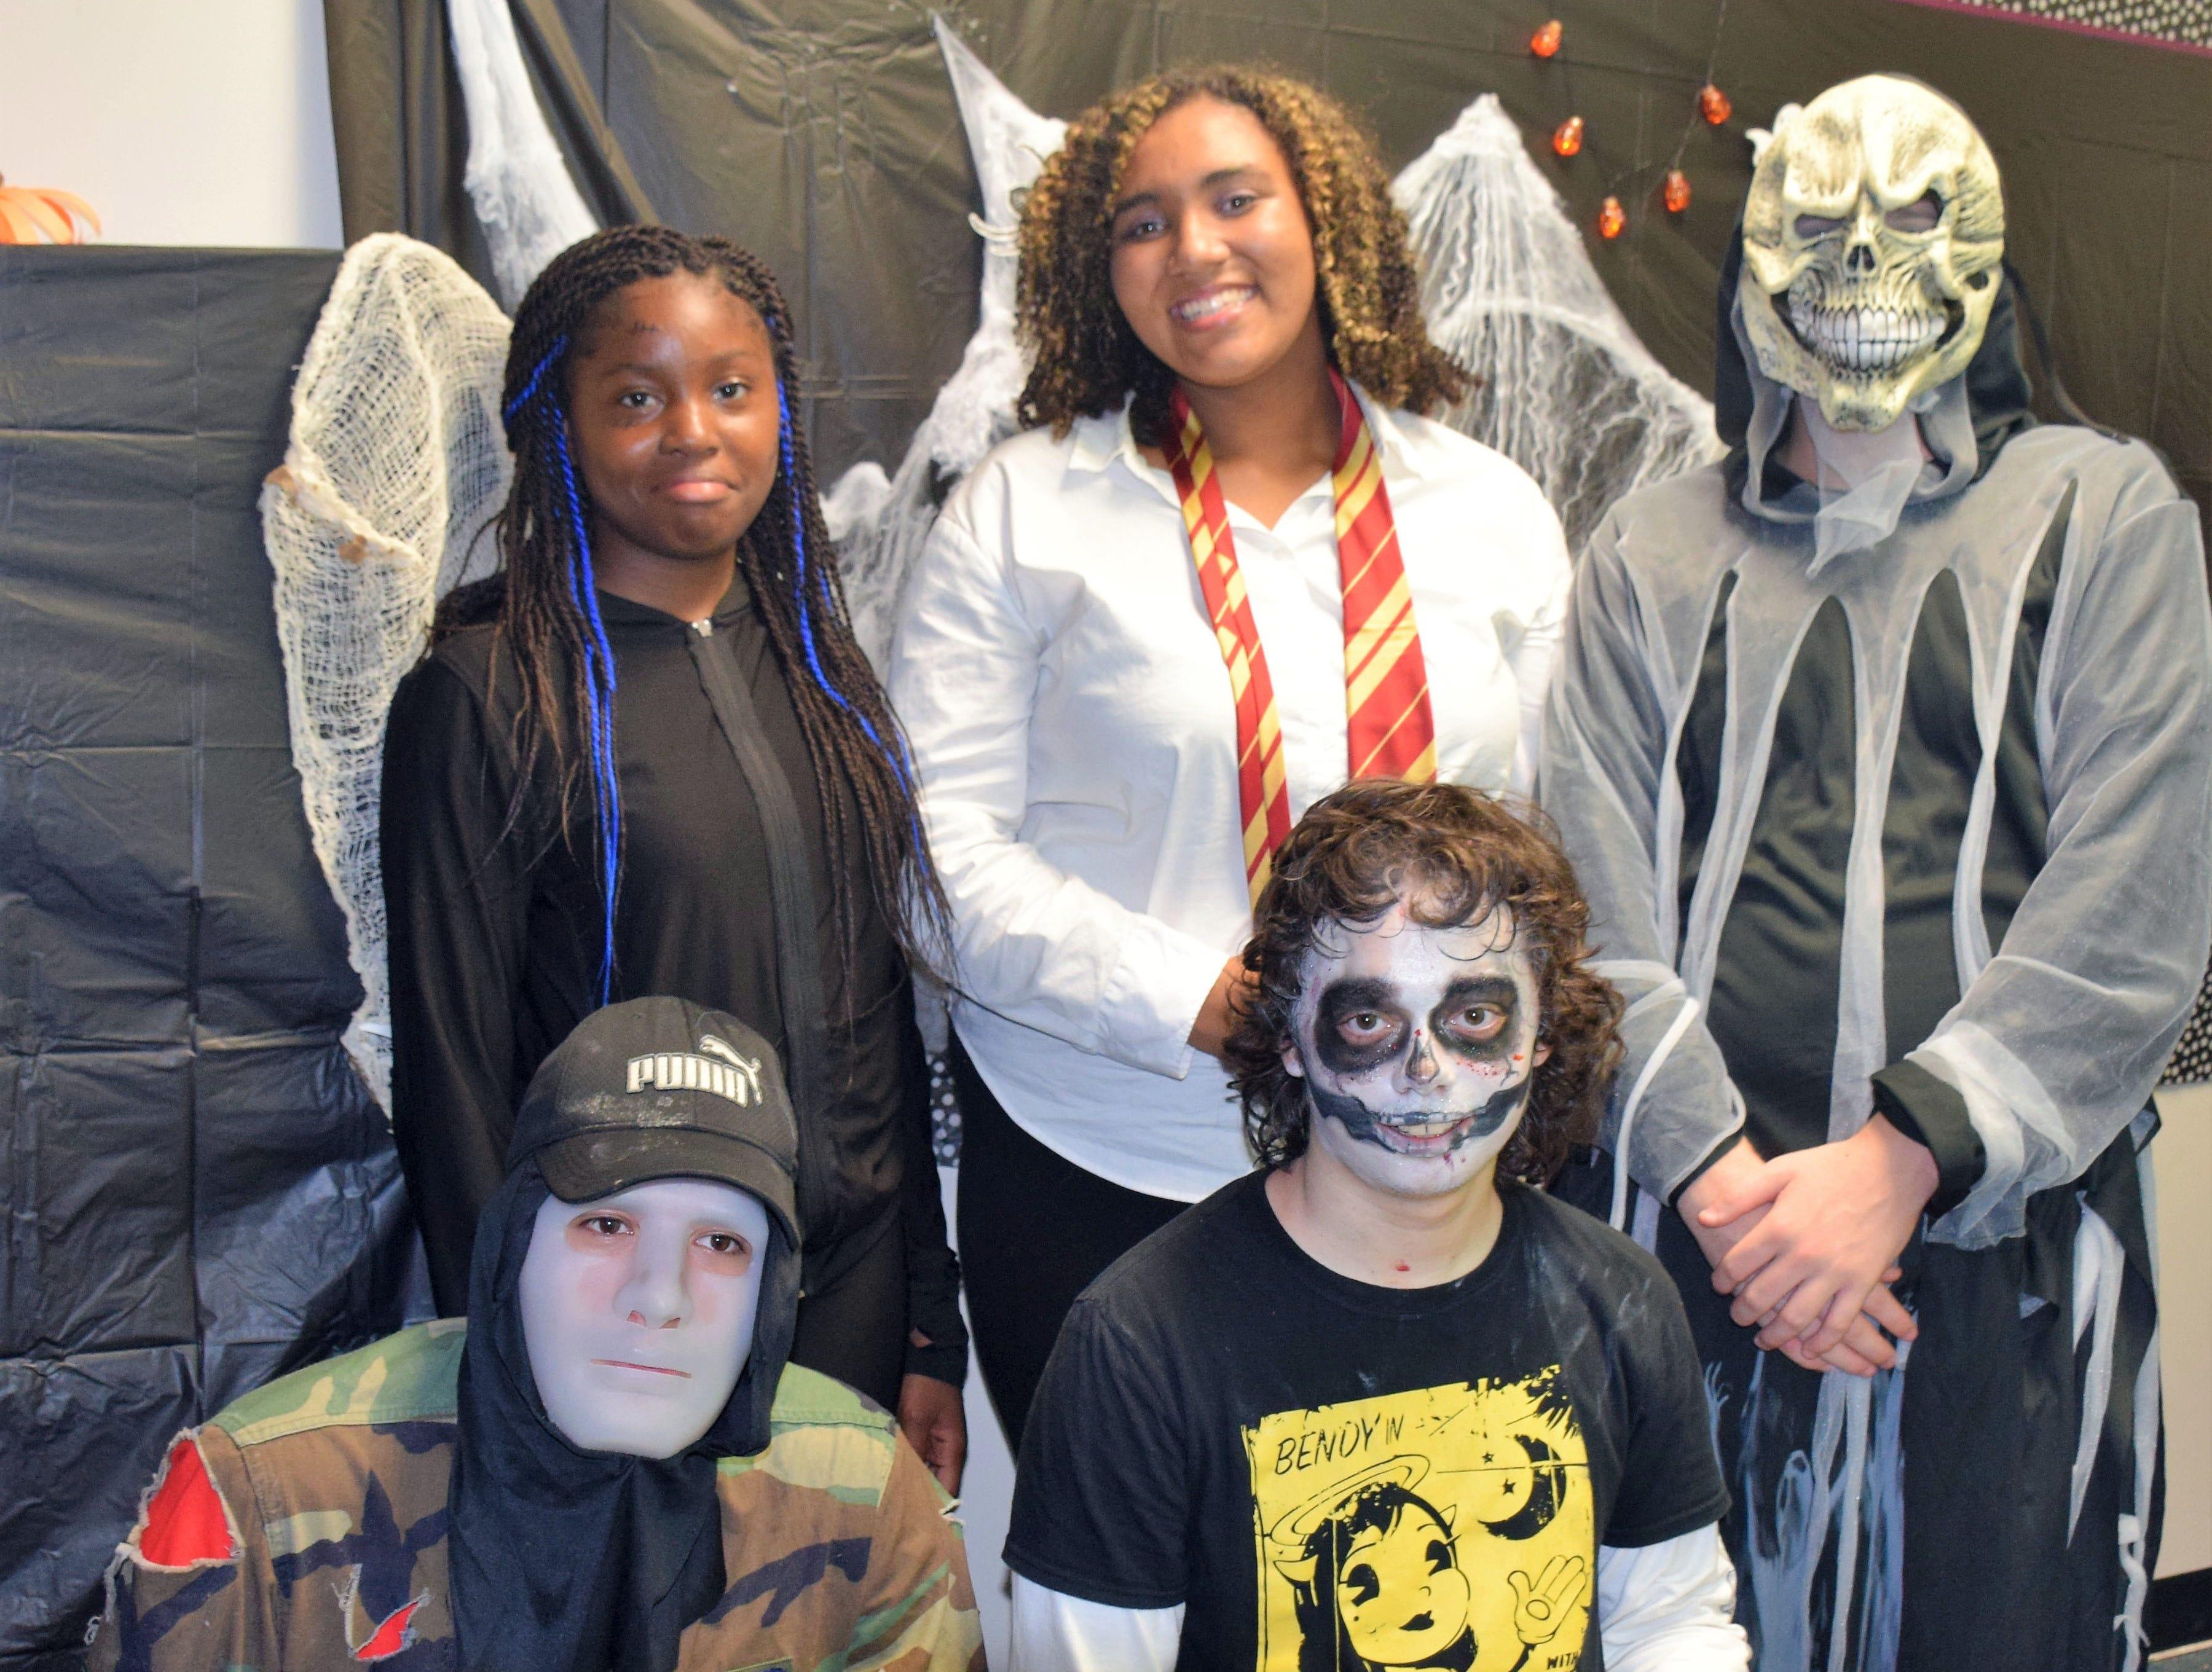 Pathfinders Marlaja, 15; Kami, 16; Kayla, 17; Mario, 13 and Deran, 15.